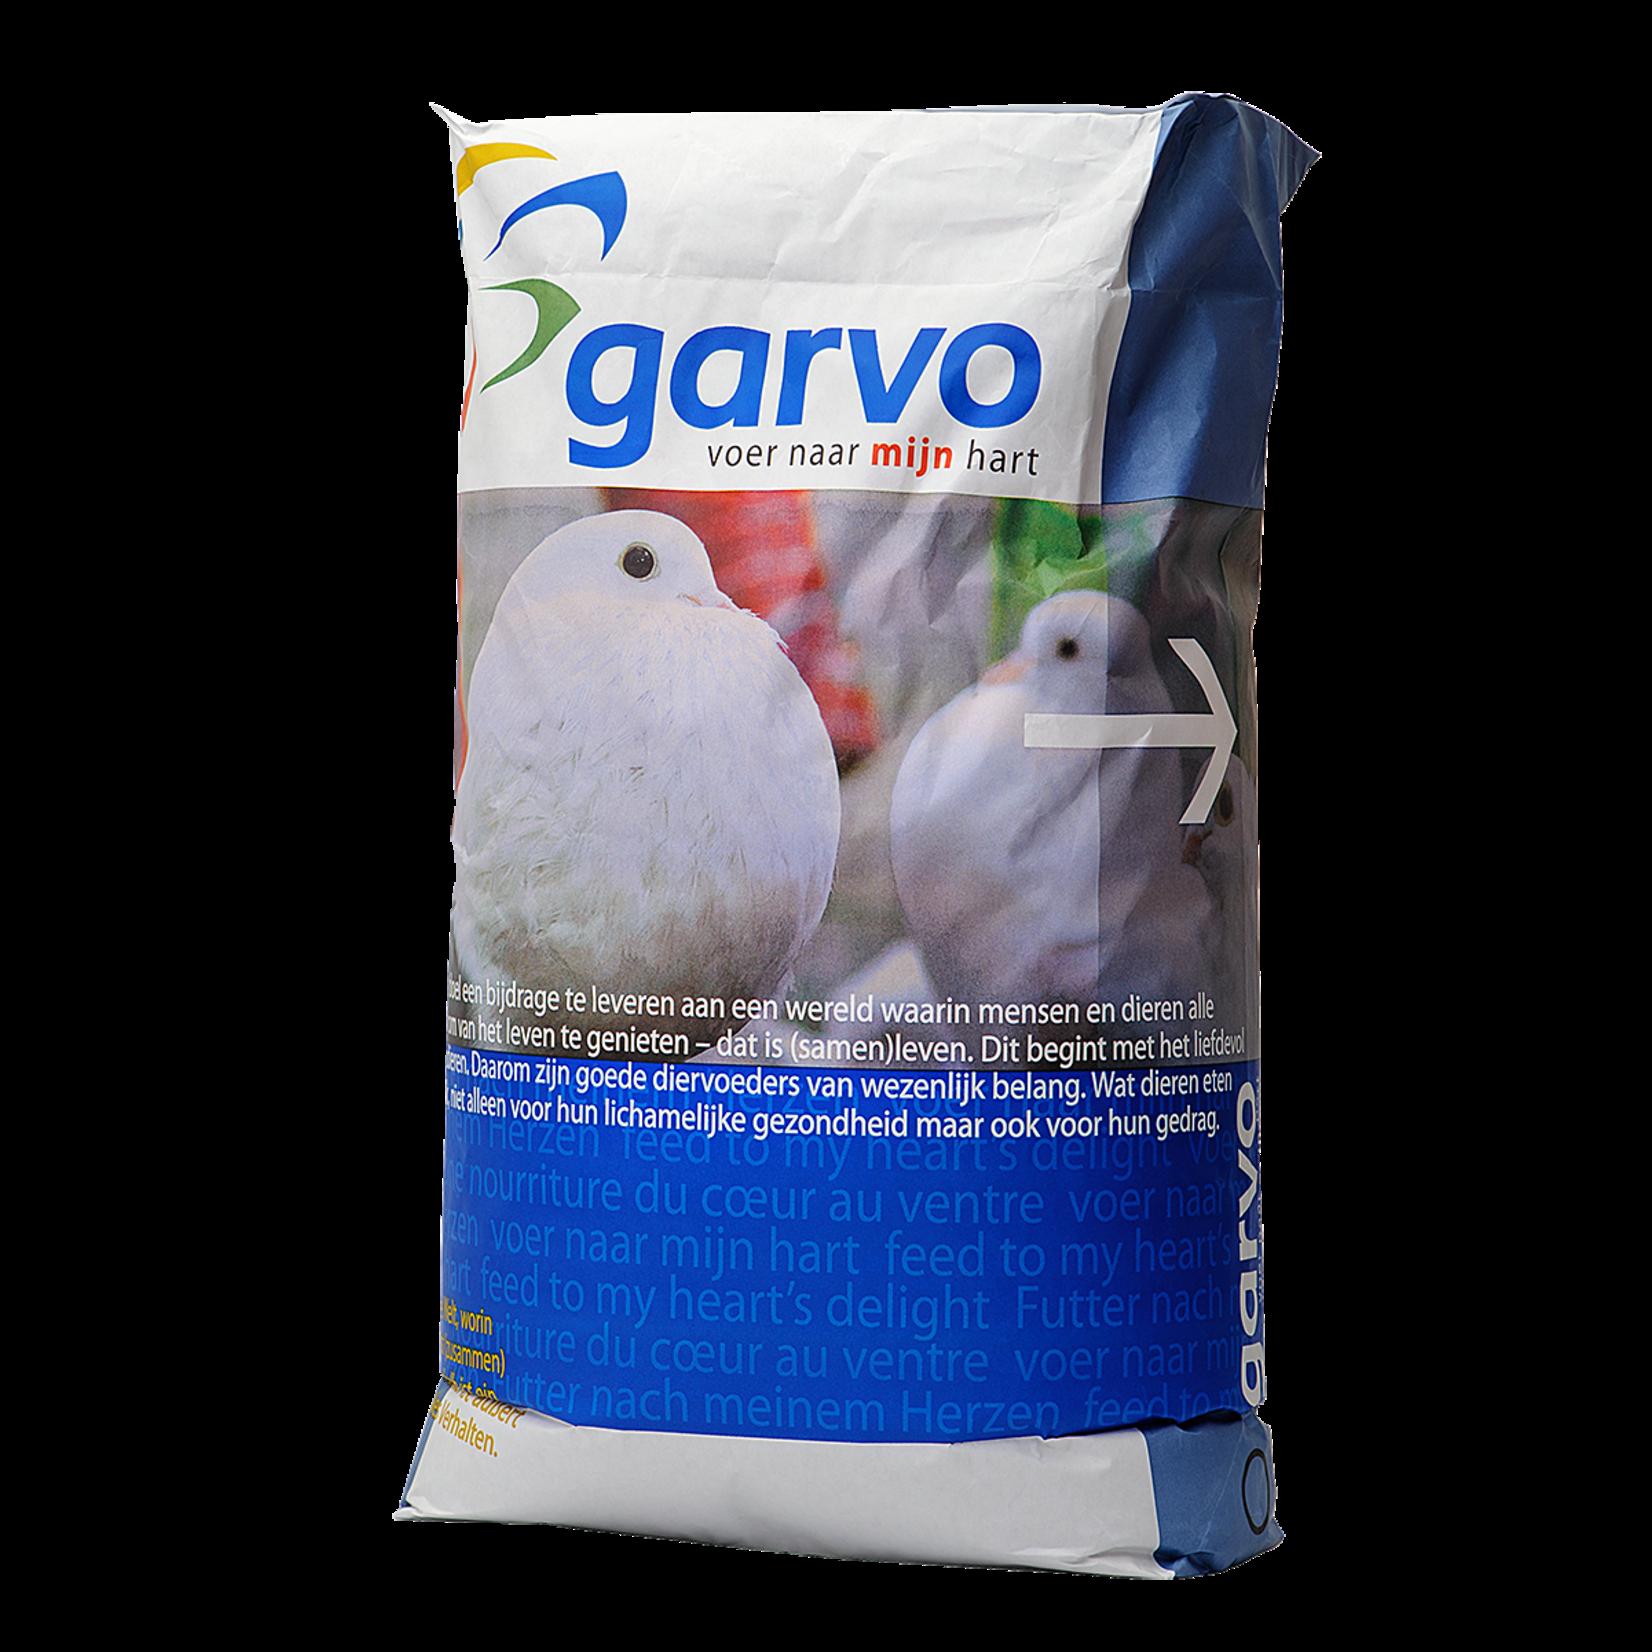 Garvo Garvo Solution 2 (Aanv. Show- En Vliegduiven) 20 KG